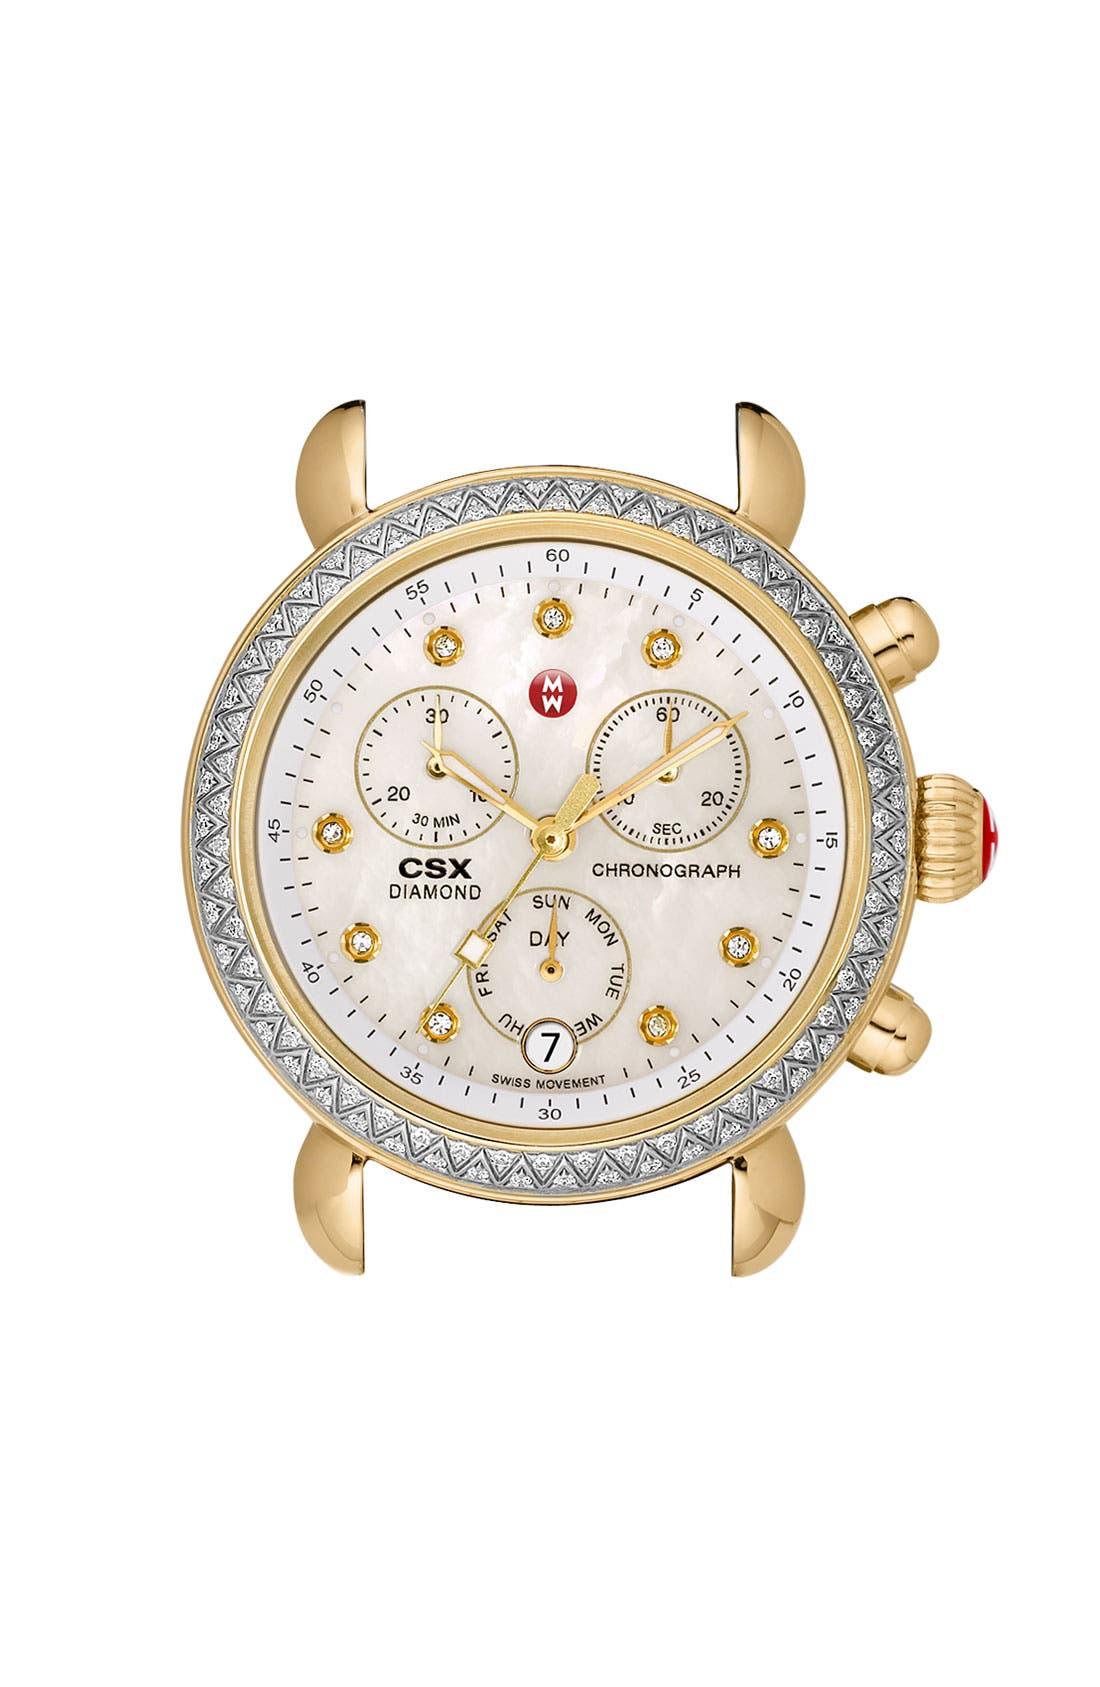 Main Image - MICHELE 'CSX-36 Diamond' Diamond Dial Two Tone Watch Case, 36mm